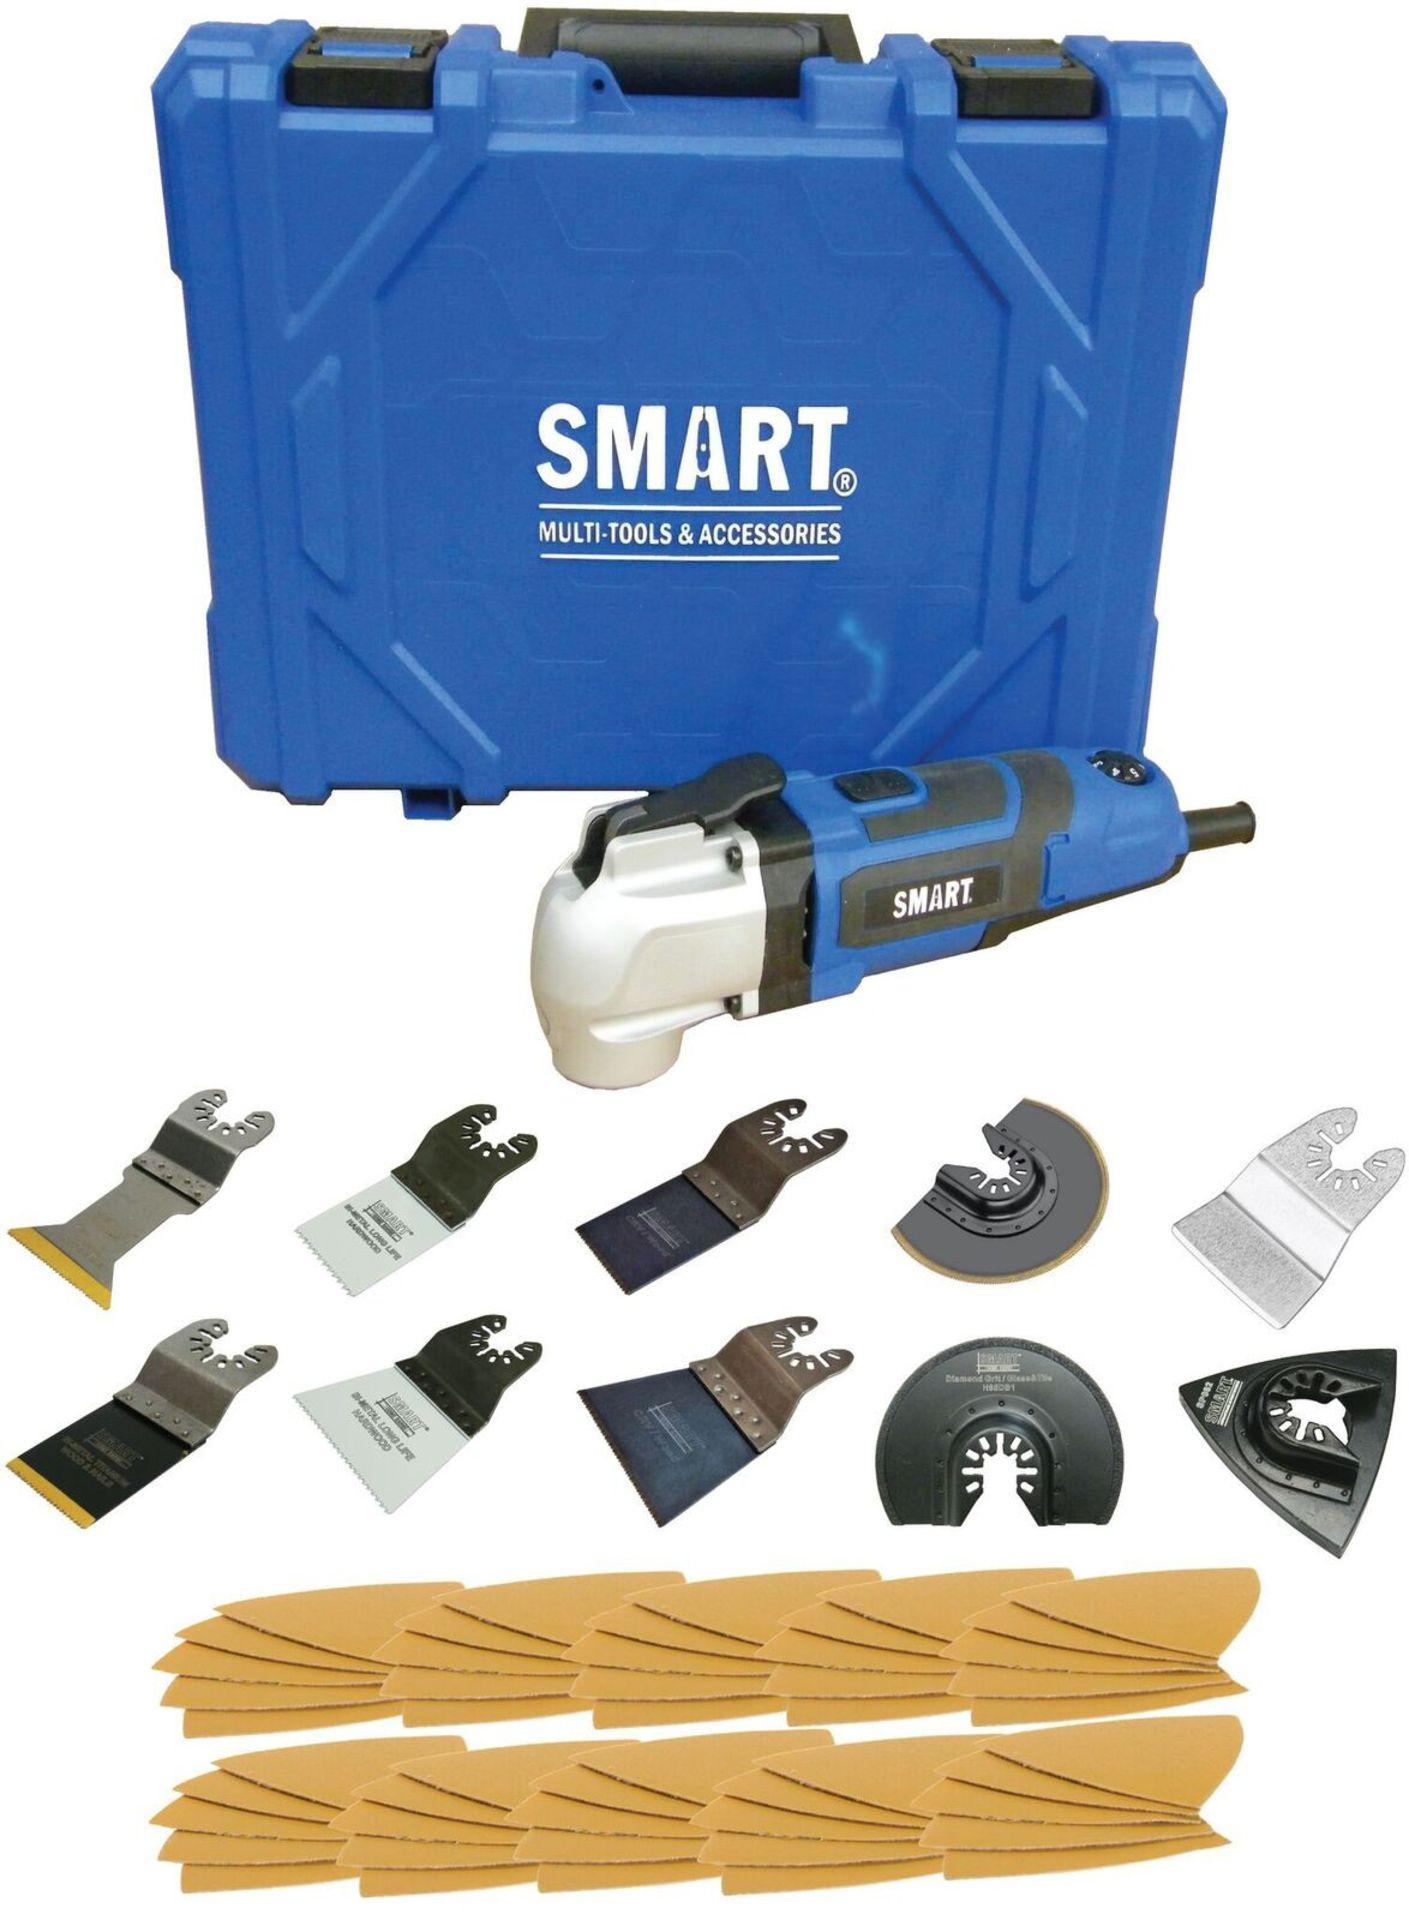 Lot 10091 - V Brand New Smart High Torque Multi Tool SMT300PL Kit - 300 Watt Motor - Tool-Less Blade Changed